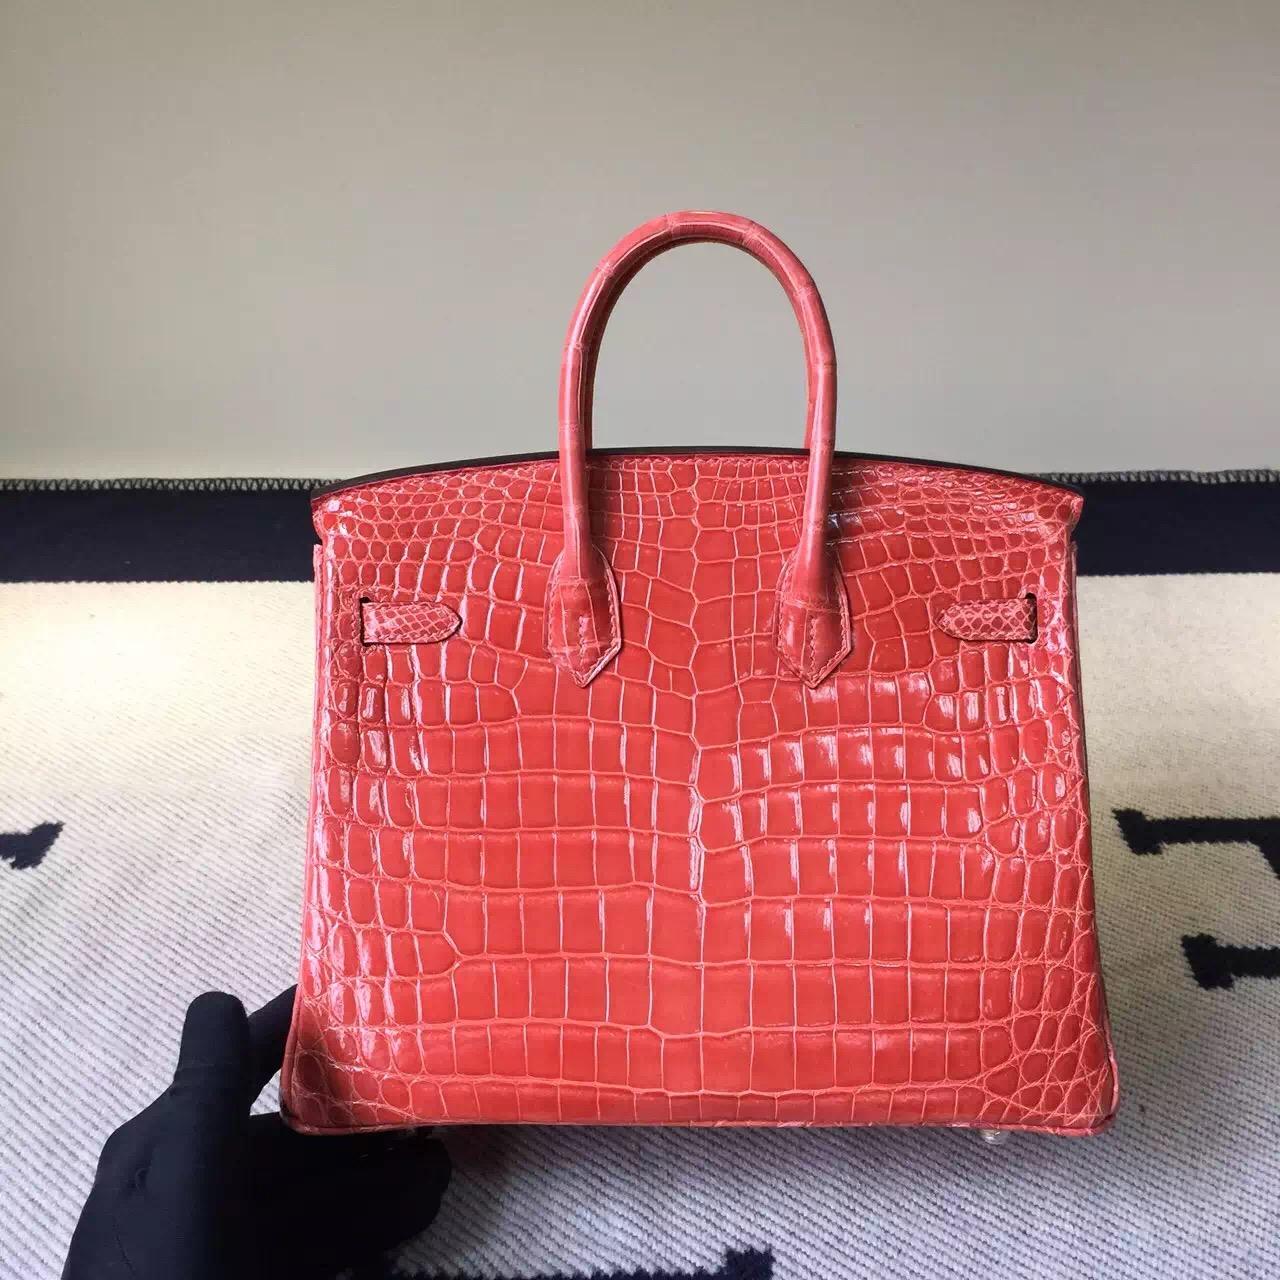 Hermes I5 Flamingo Crocodile Shiny Leather Birkin Bag 25cm